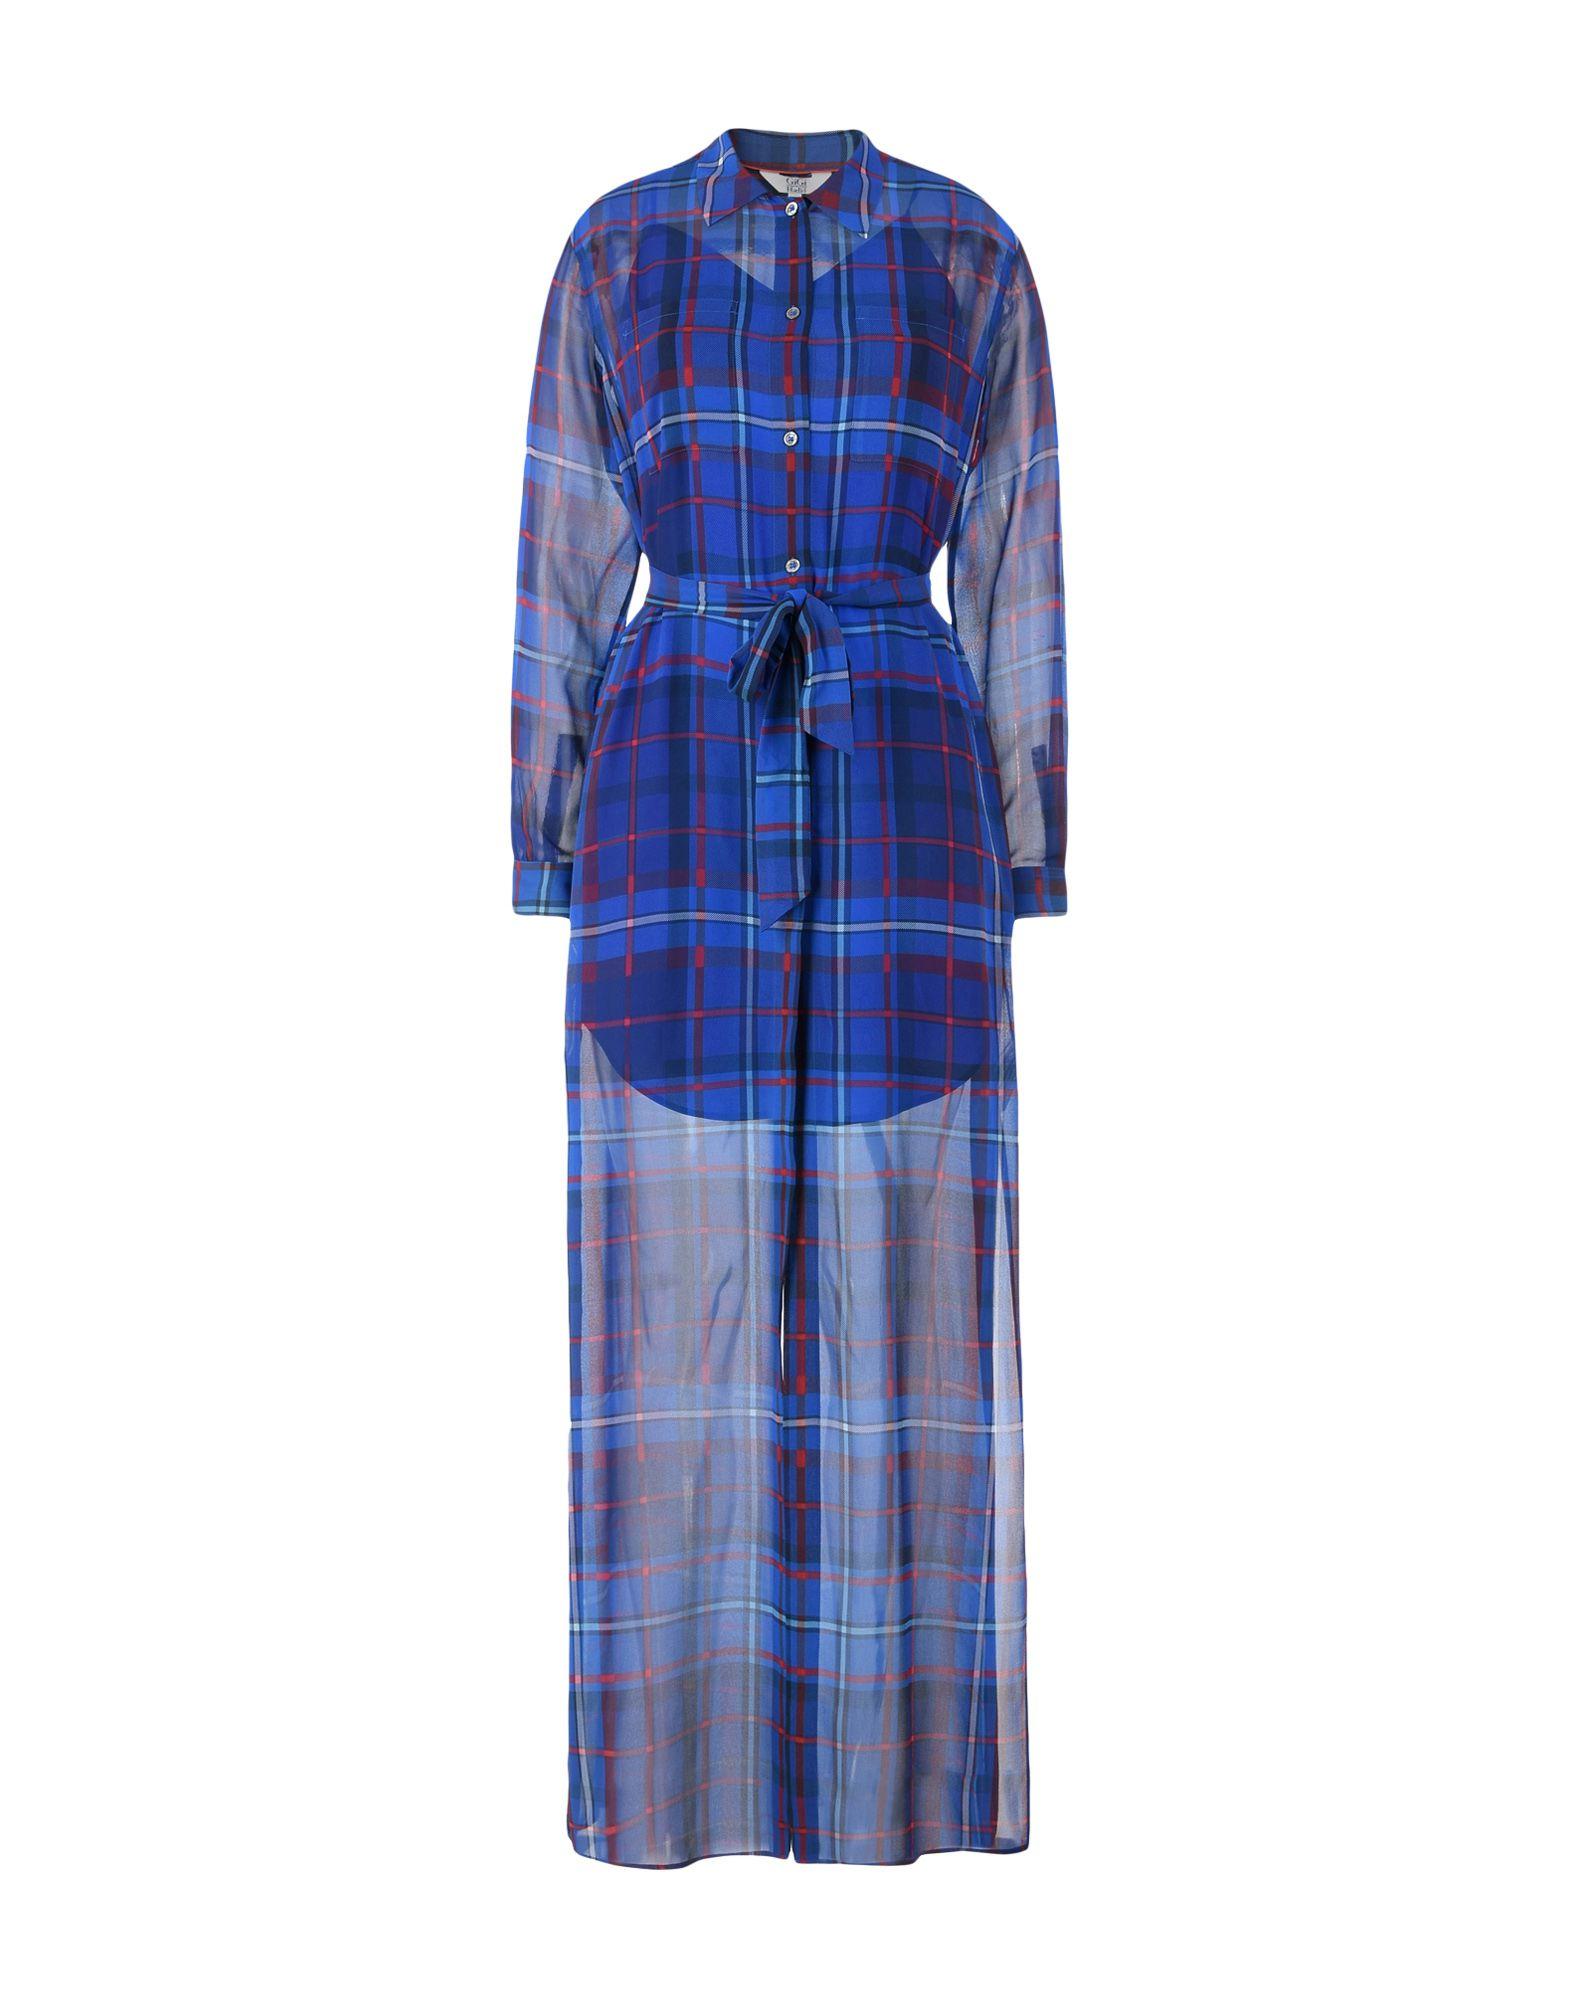 GIGI HADID x TOMMY HILFIGER Damen Langes Kleid Farbe Blau Größe 4